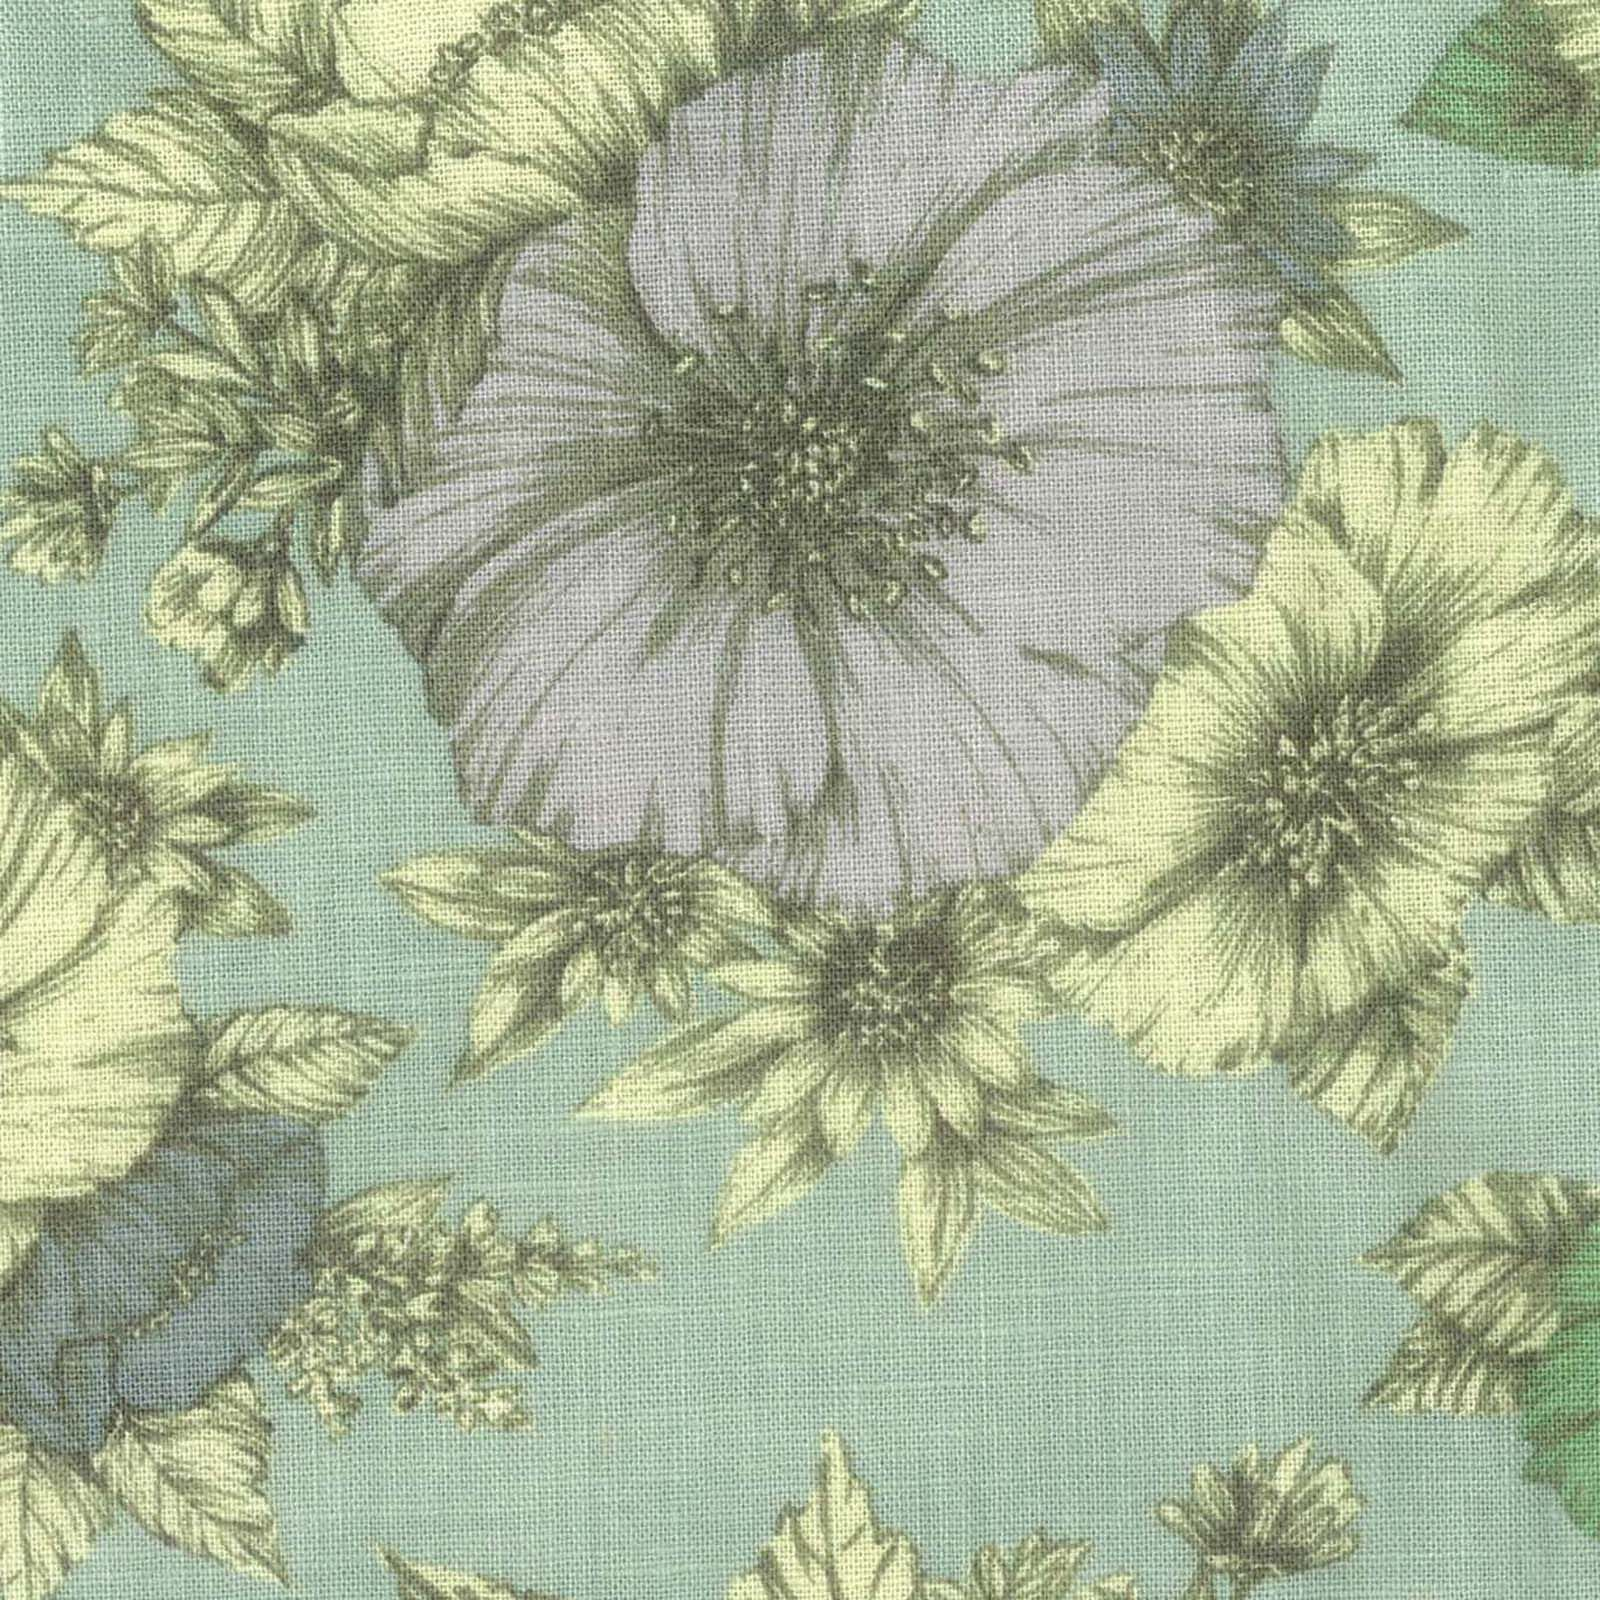 Fashion Linen Fabric- Vintage Floral Aqua LinenFashion Linen Fabric- Vintage Floral Aqua Linen,